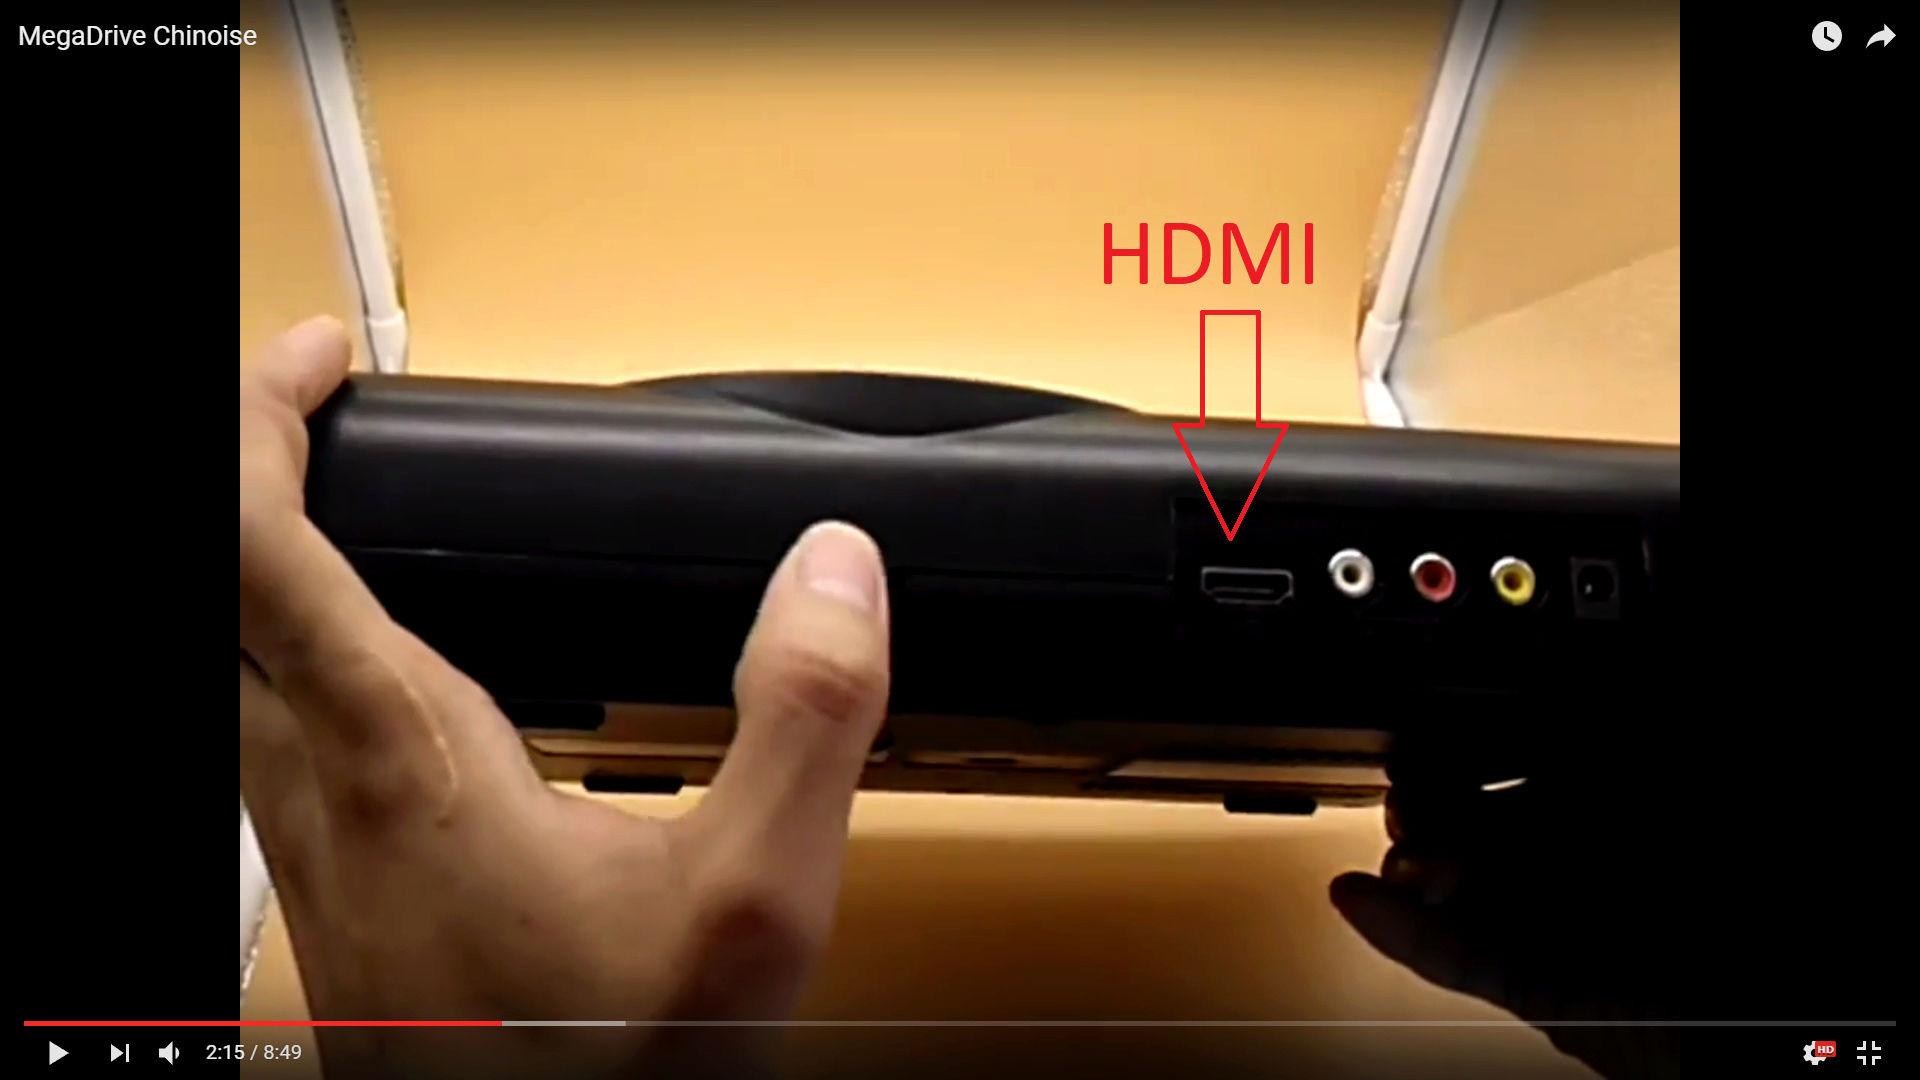 Nouvelle Megadrive HDMI chinoise - Page 2 Hdmi10